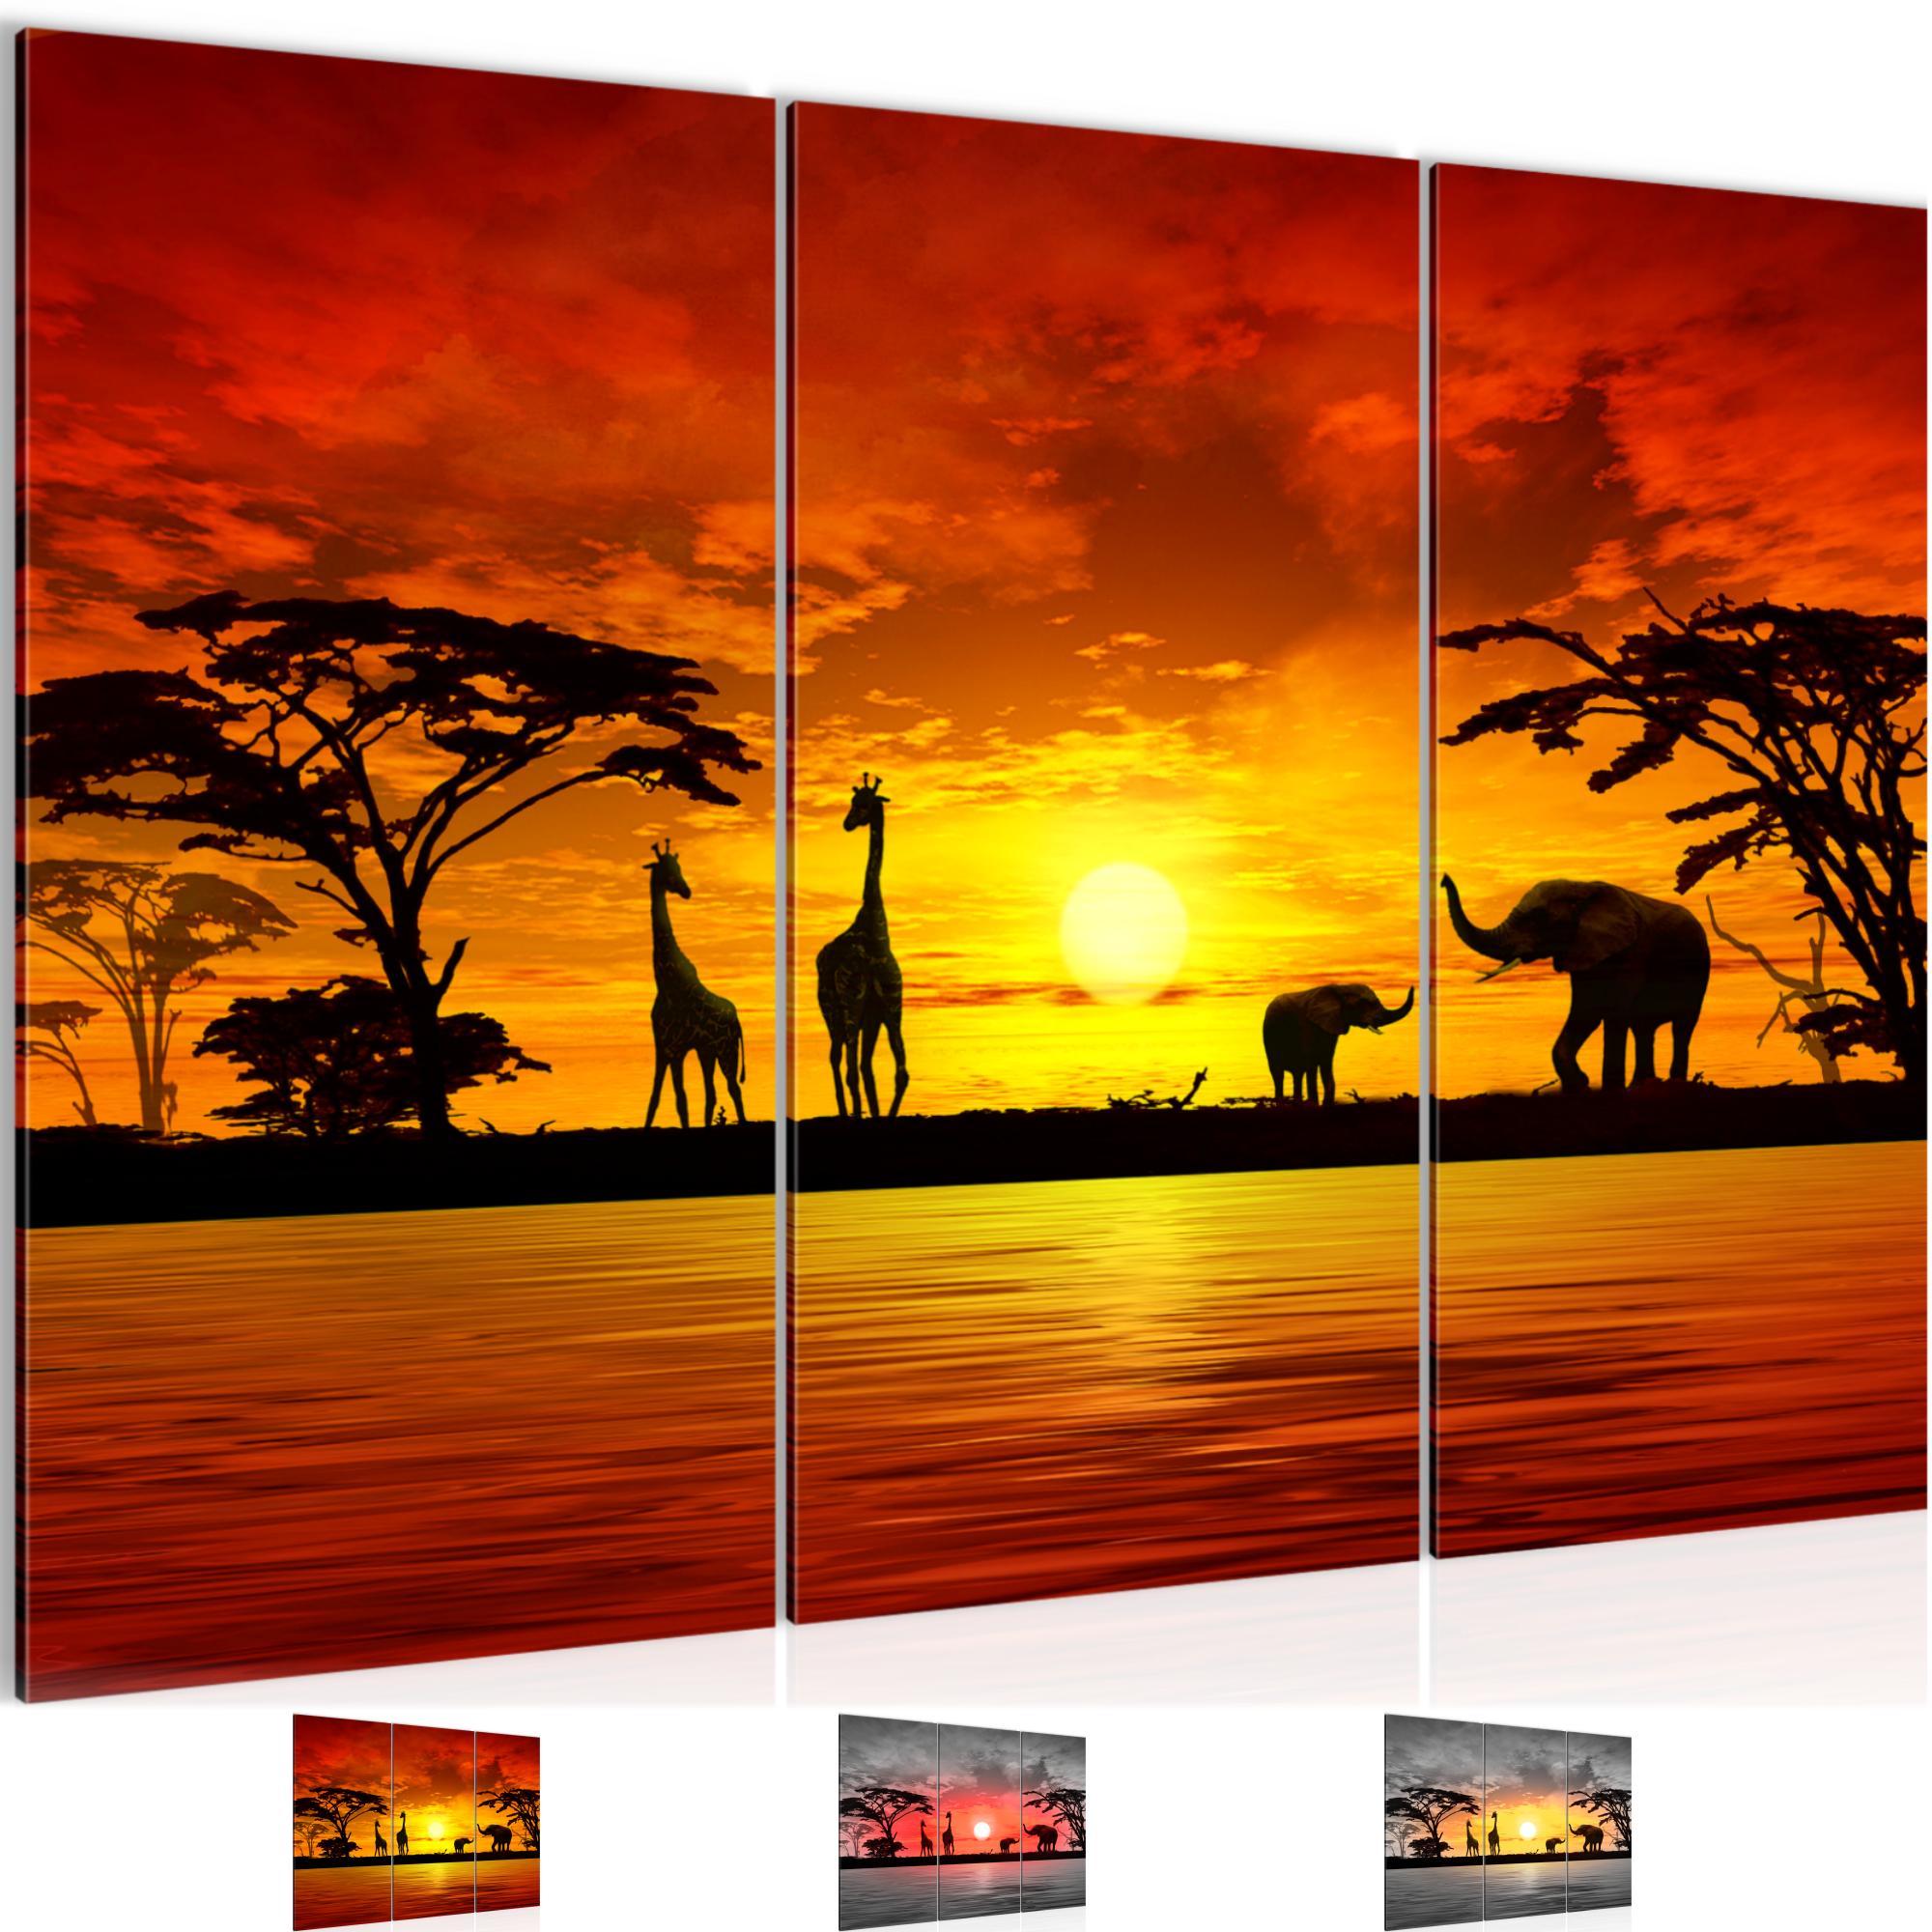 Afrika sonnenuntergang bild kunstdruck auf vlies leinwand xxl dekoration 000231p - Dekoration afrika ...